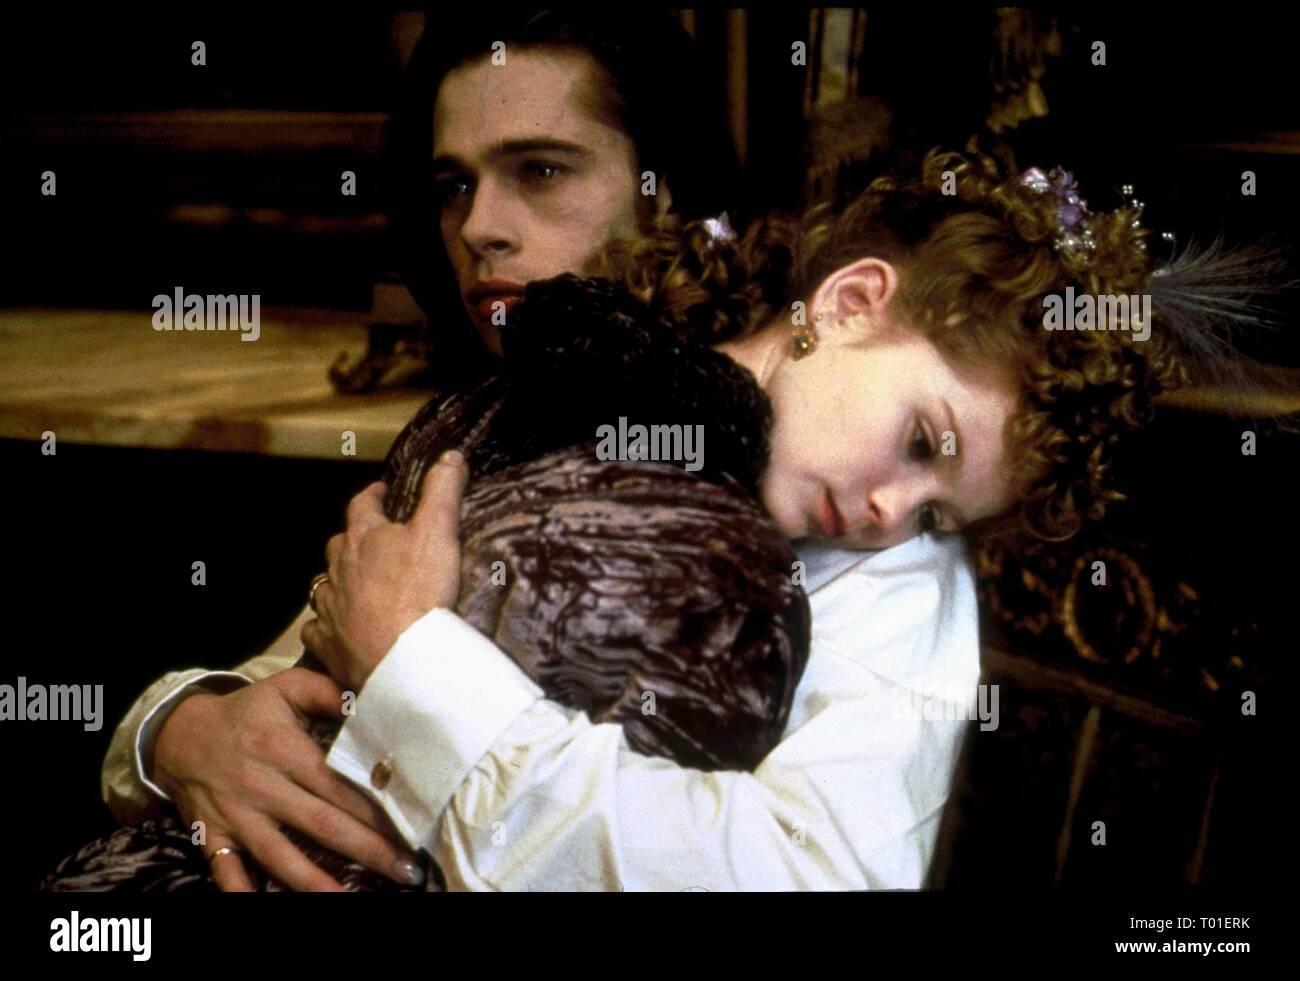 Alyssa Milano Embrace Of The Vampire embrace of the vampire stock photos & embrace of the vampire